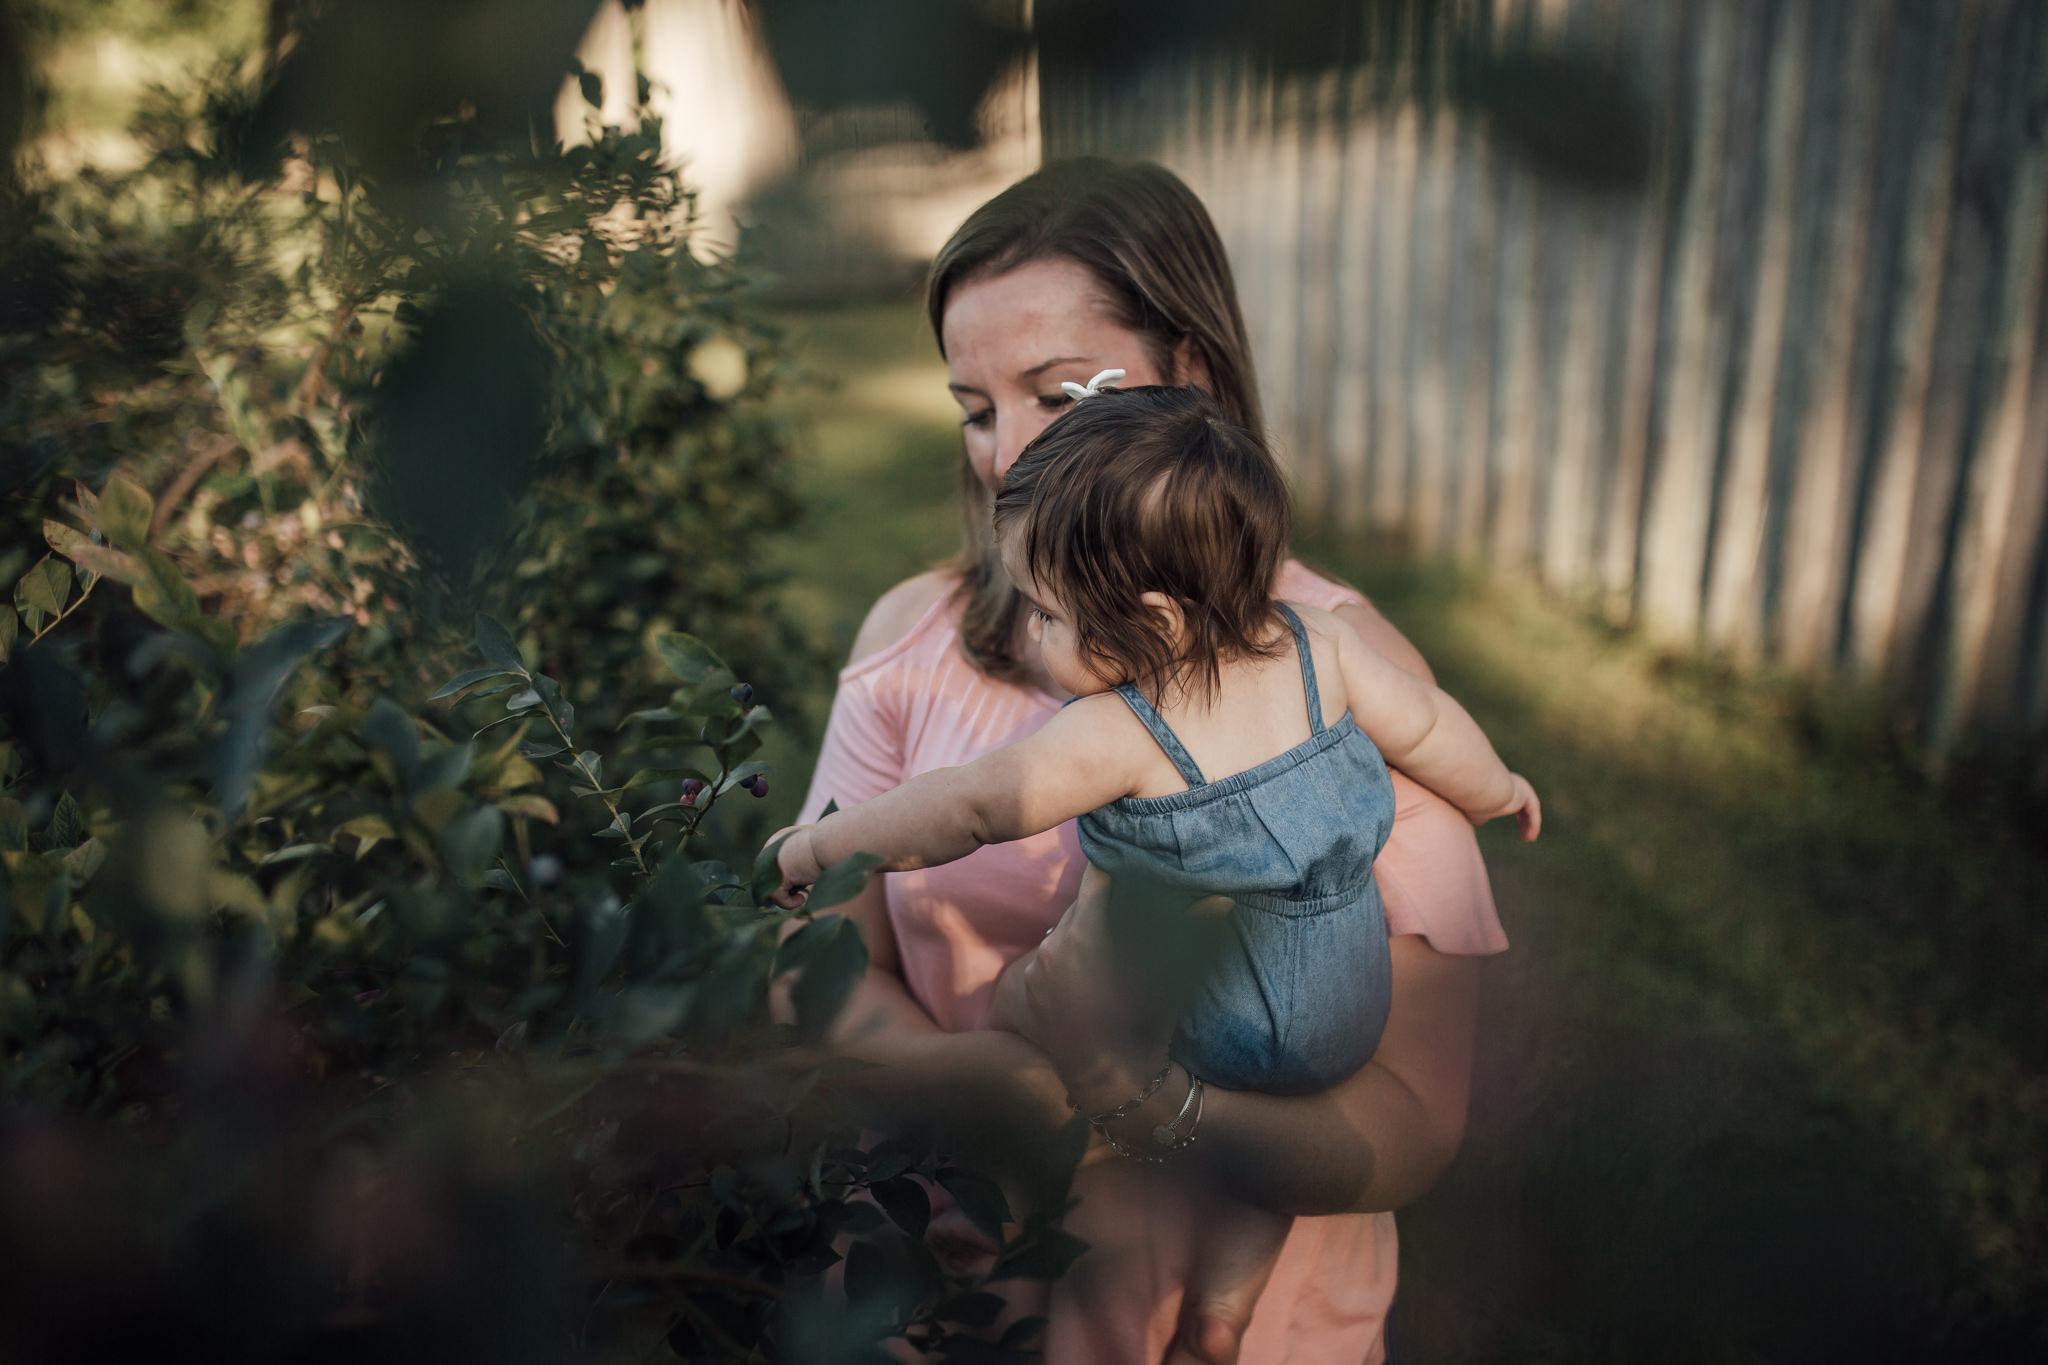 memphis-family-photographer-cassie-cook-photography-16.jpg